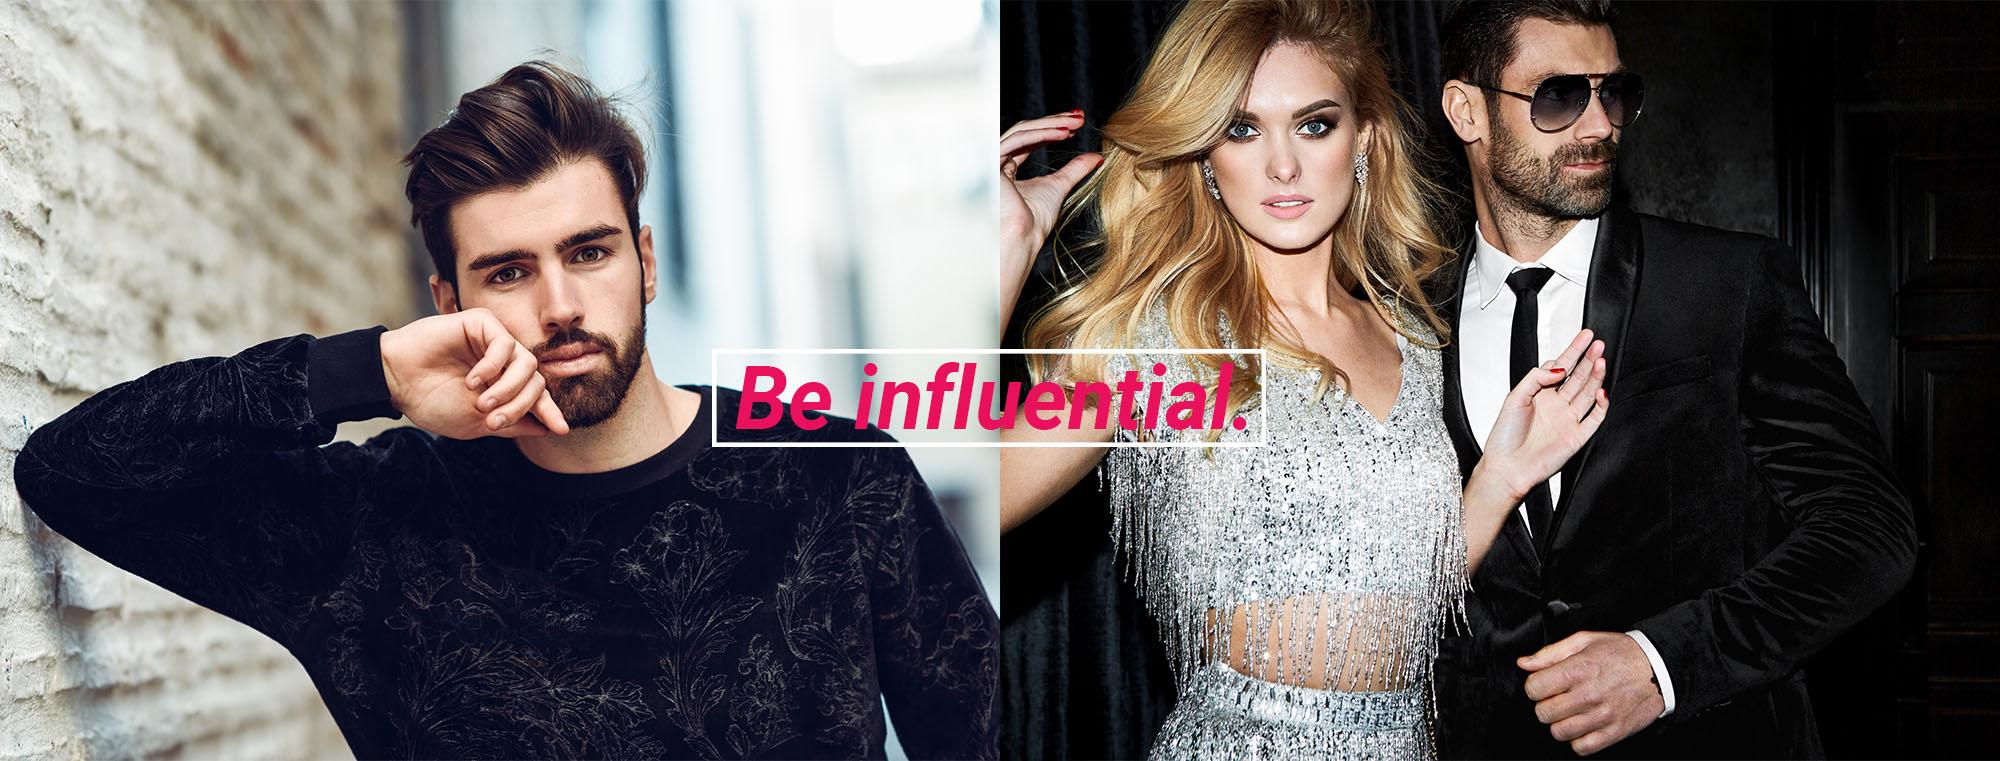 Be influental